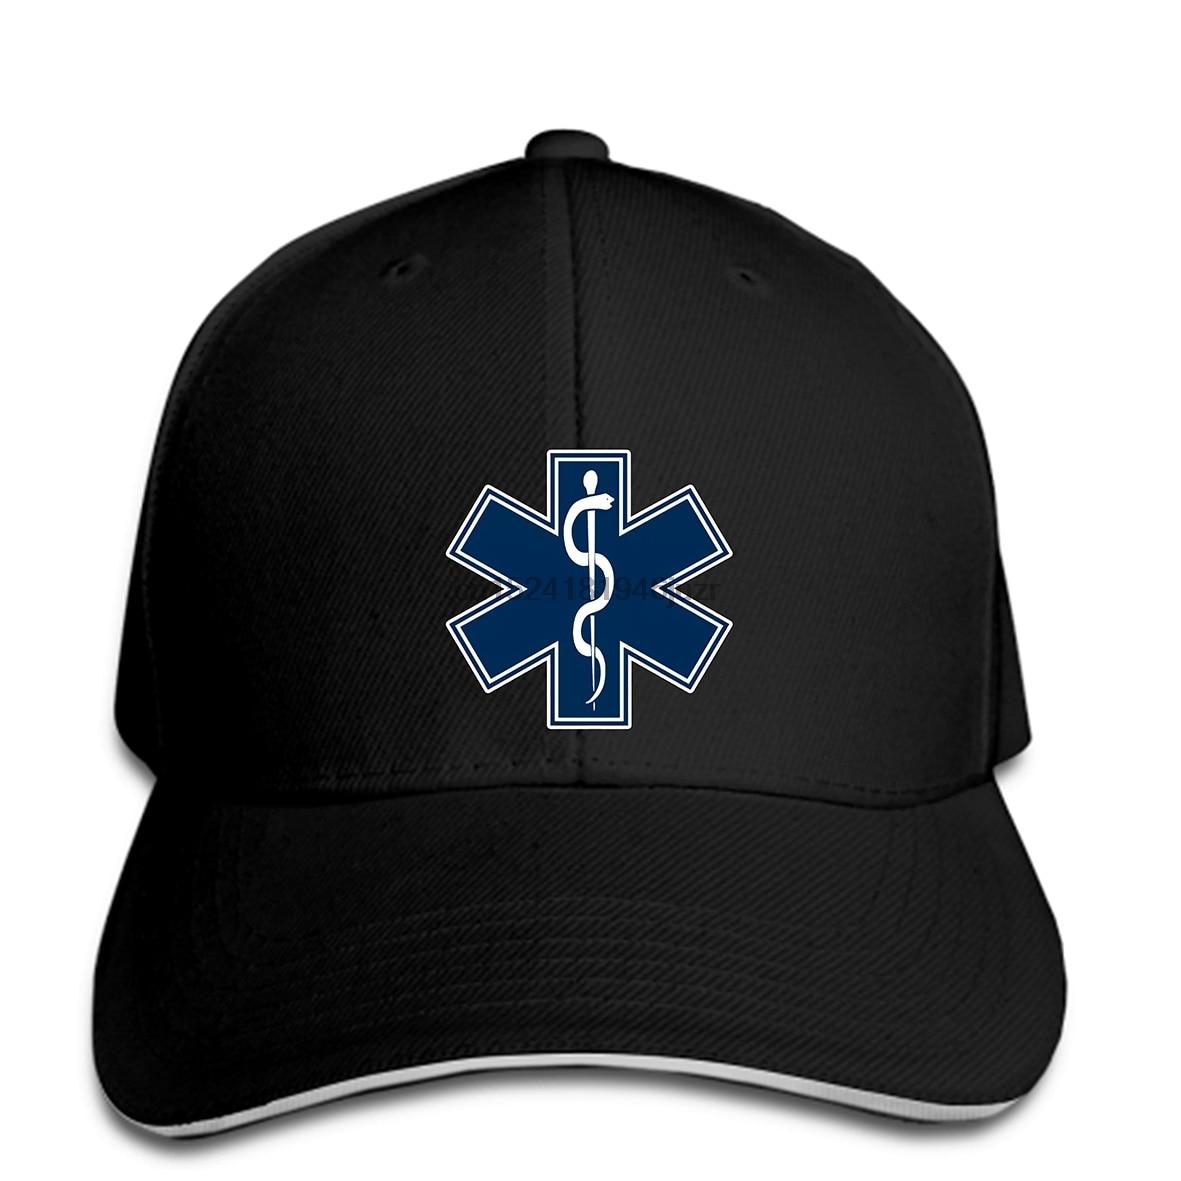 20eedf26b41 hip hop Baseball caps Custom Printed Men Paramedic EMT EMS Star of Life  women snapback-in Baseball Caps from Apparel Accessories on Aliexpress.com